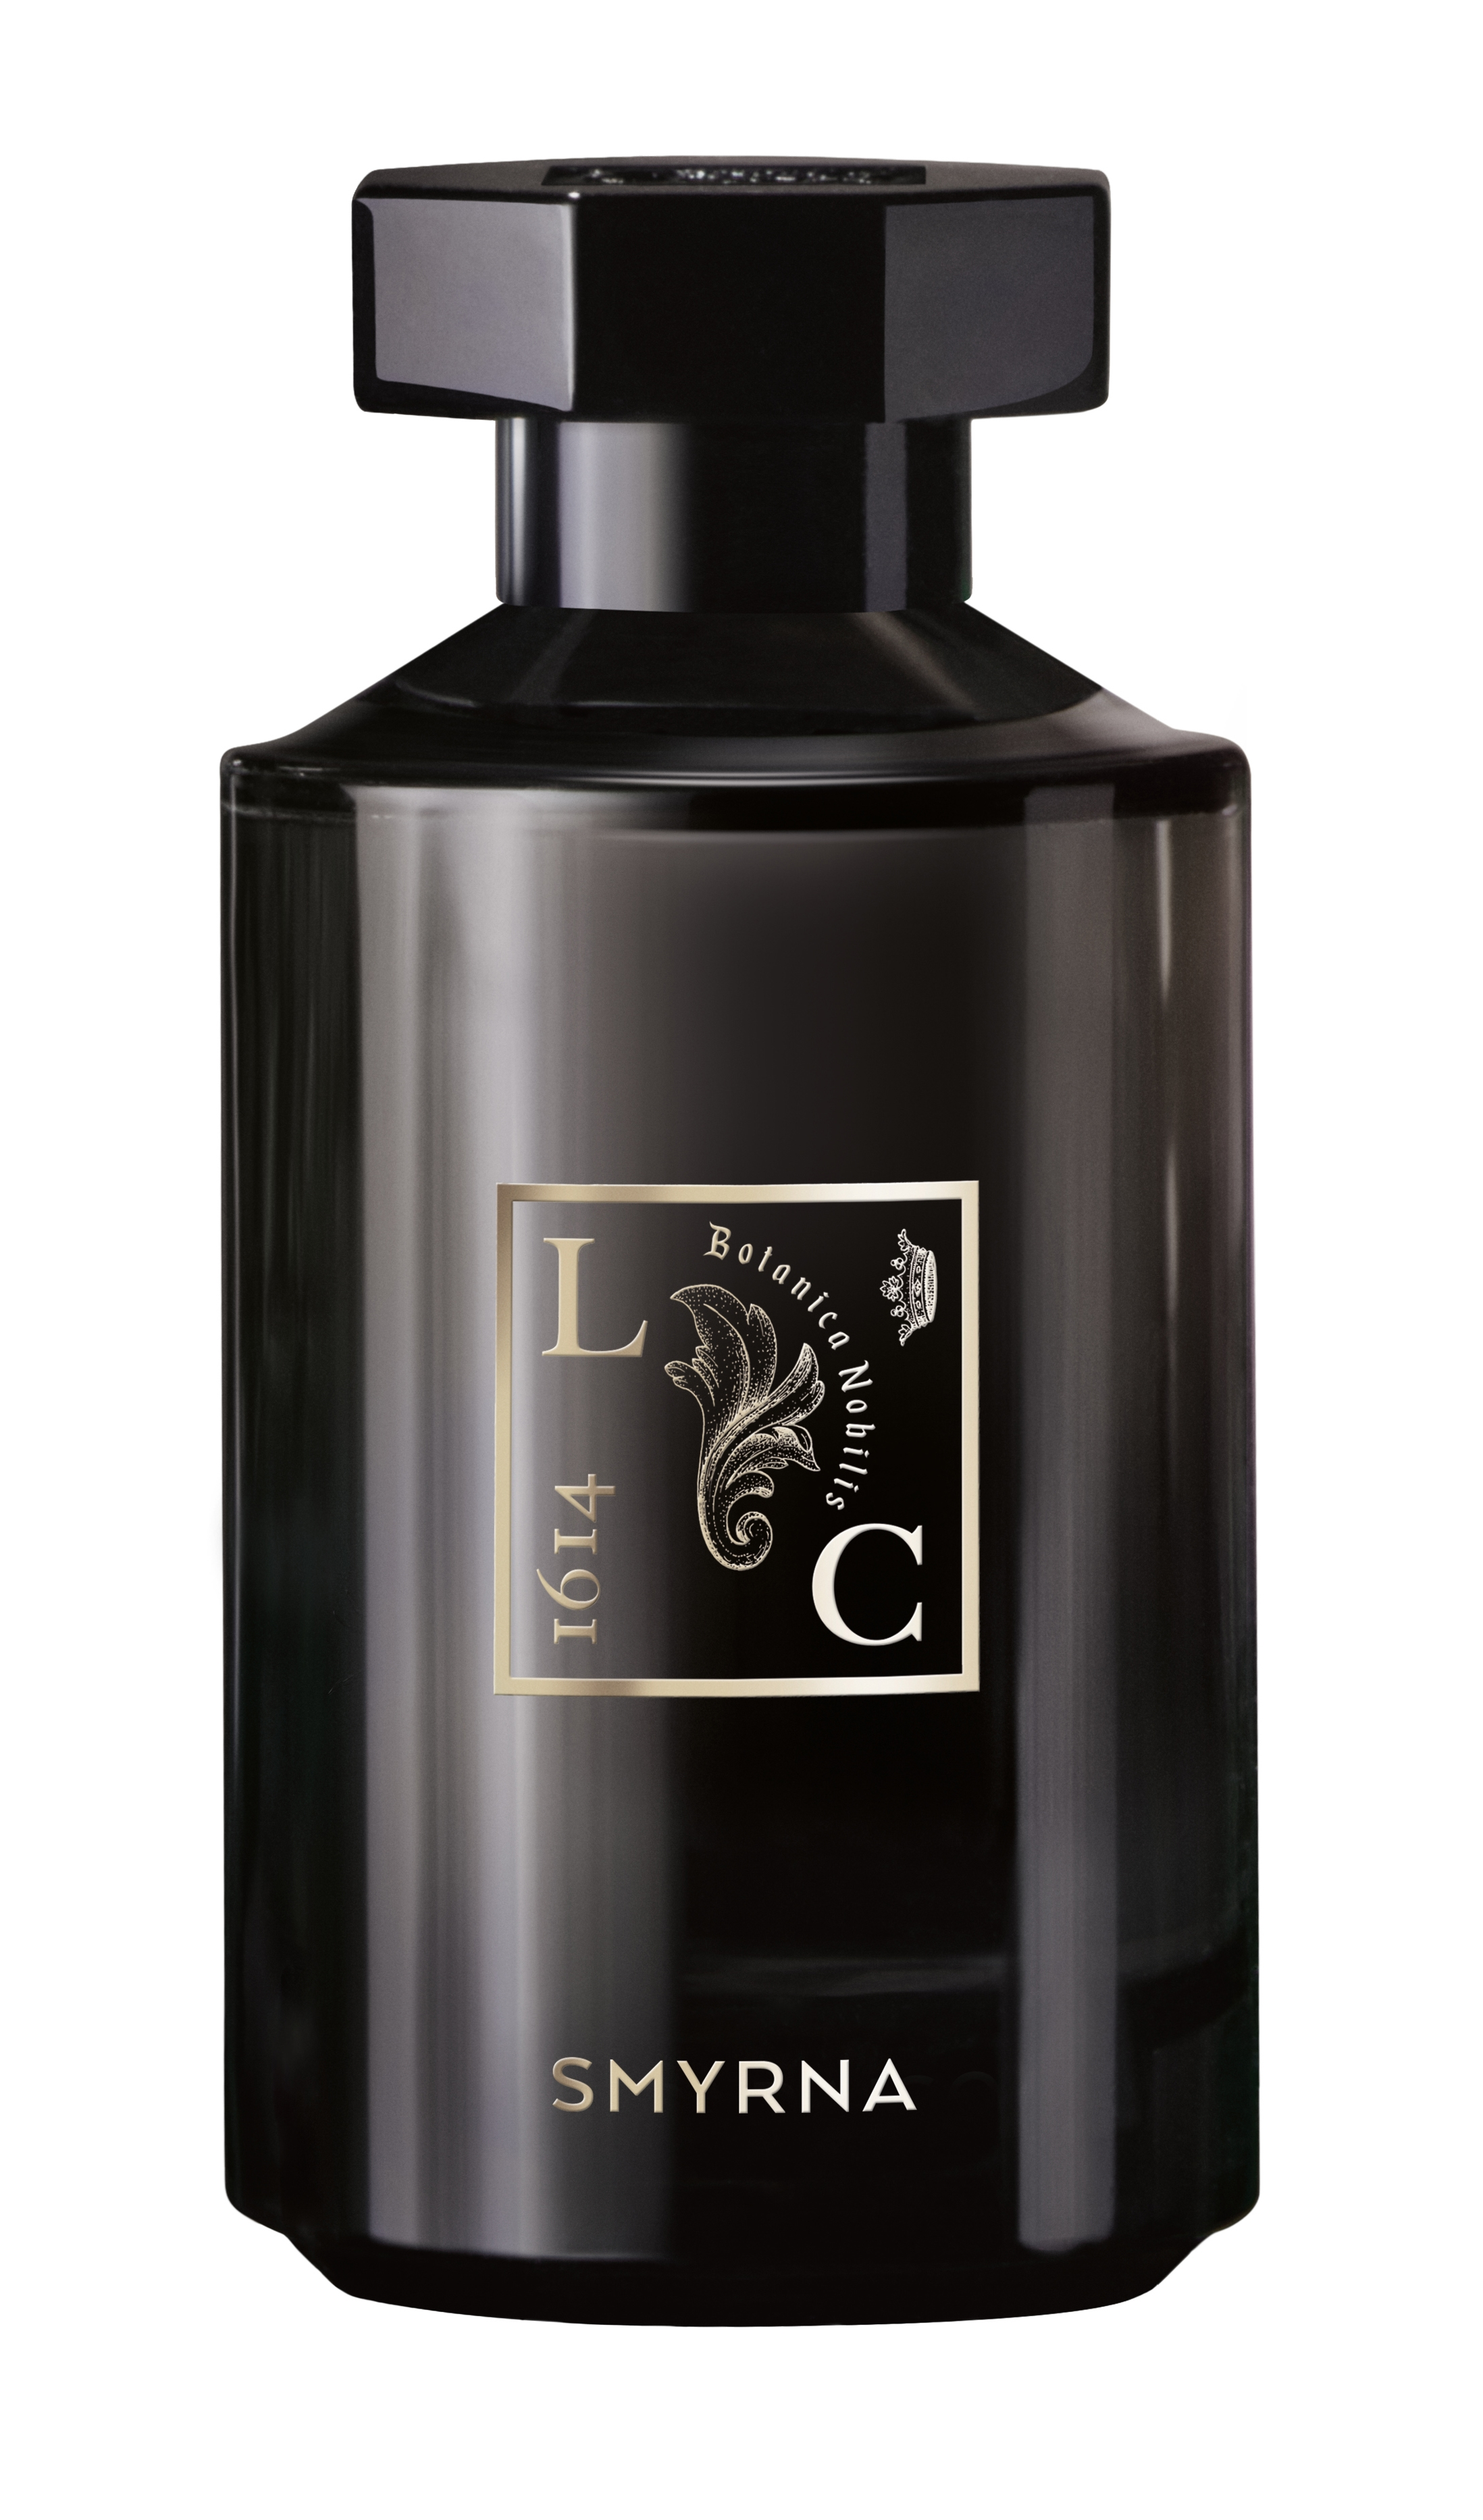 Remarkable Perfume Smyrna Edp 100ml